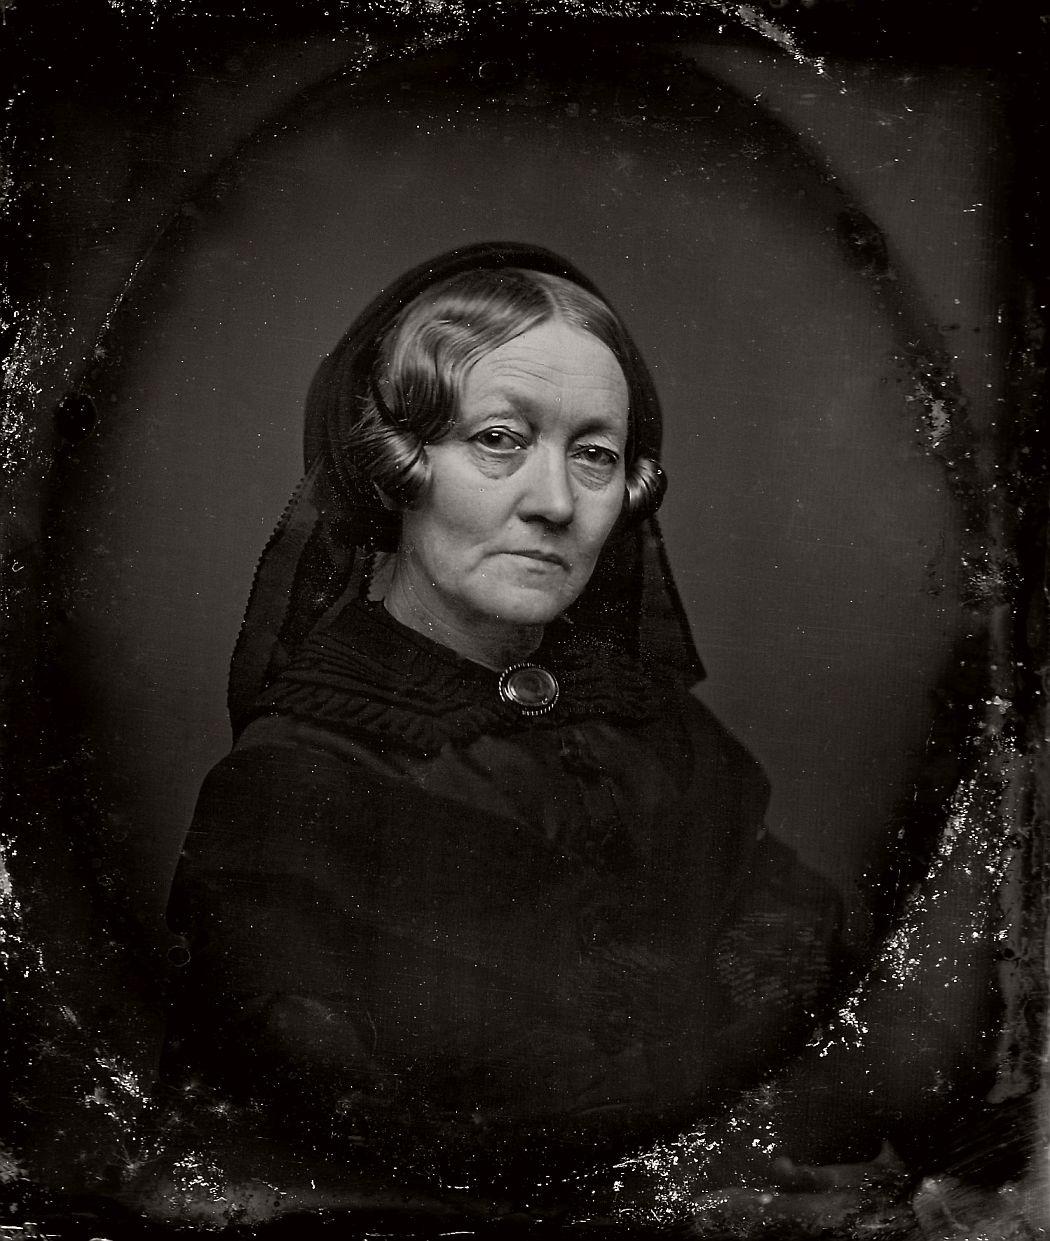 vintage-daguerreotypes-of-widows-in-mourning-victorian-era-1800s-42